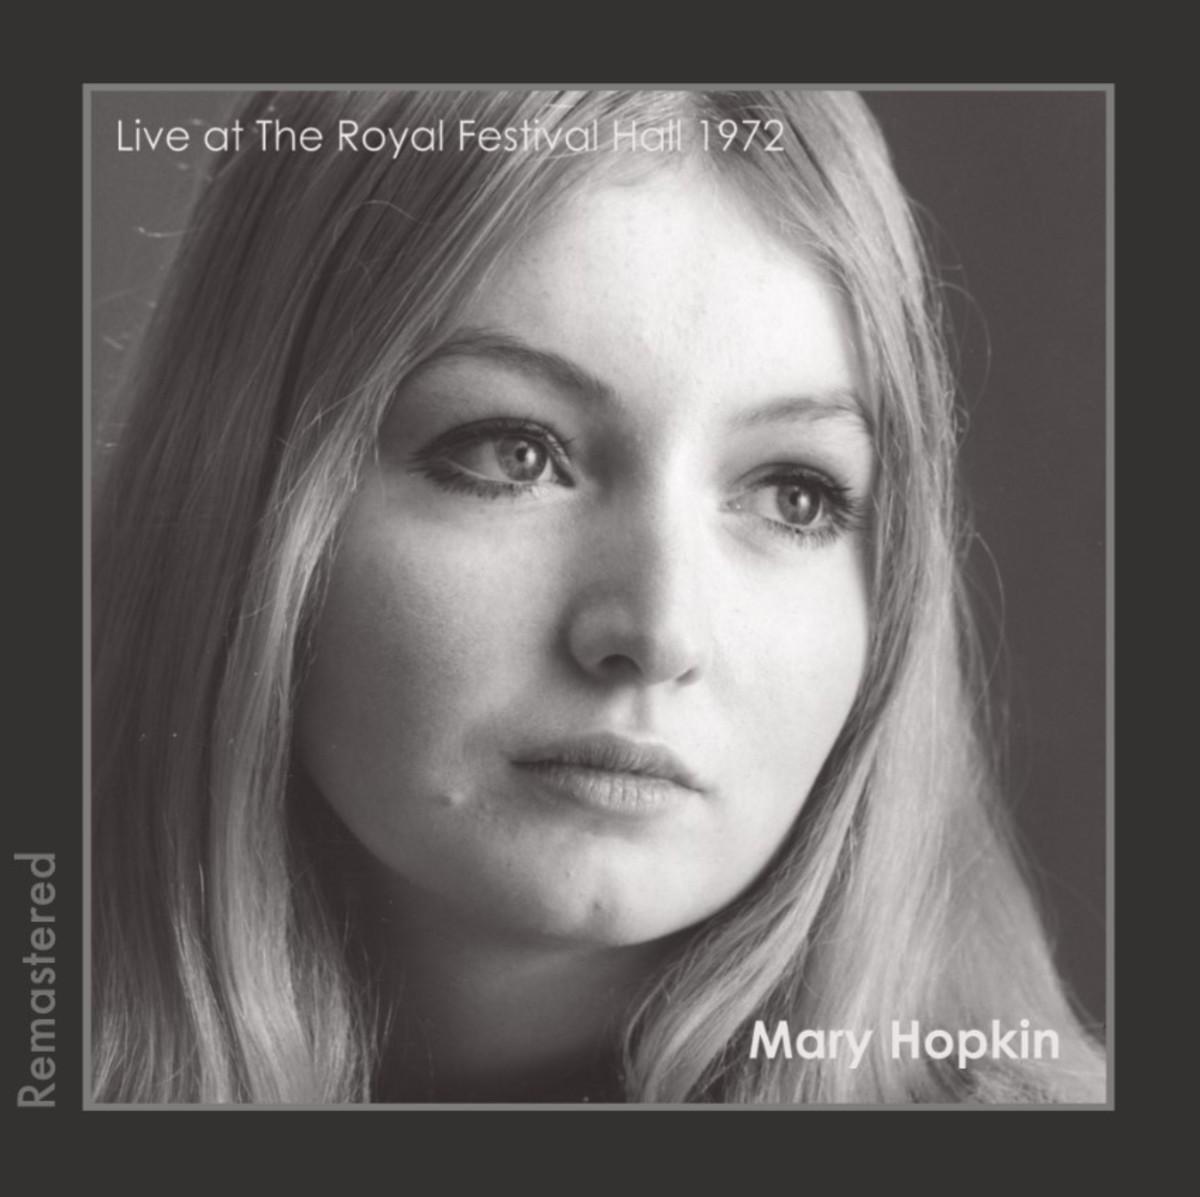 Mary Hopkin Live at The Royal Festival Hall remastered hi res